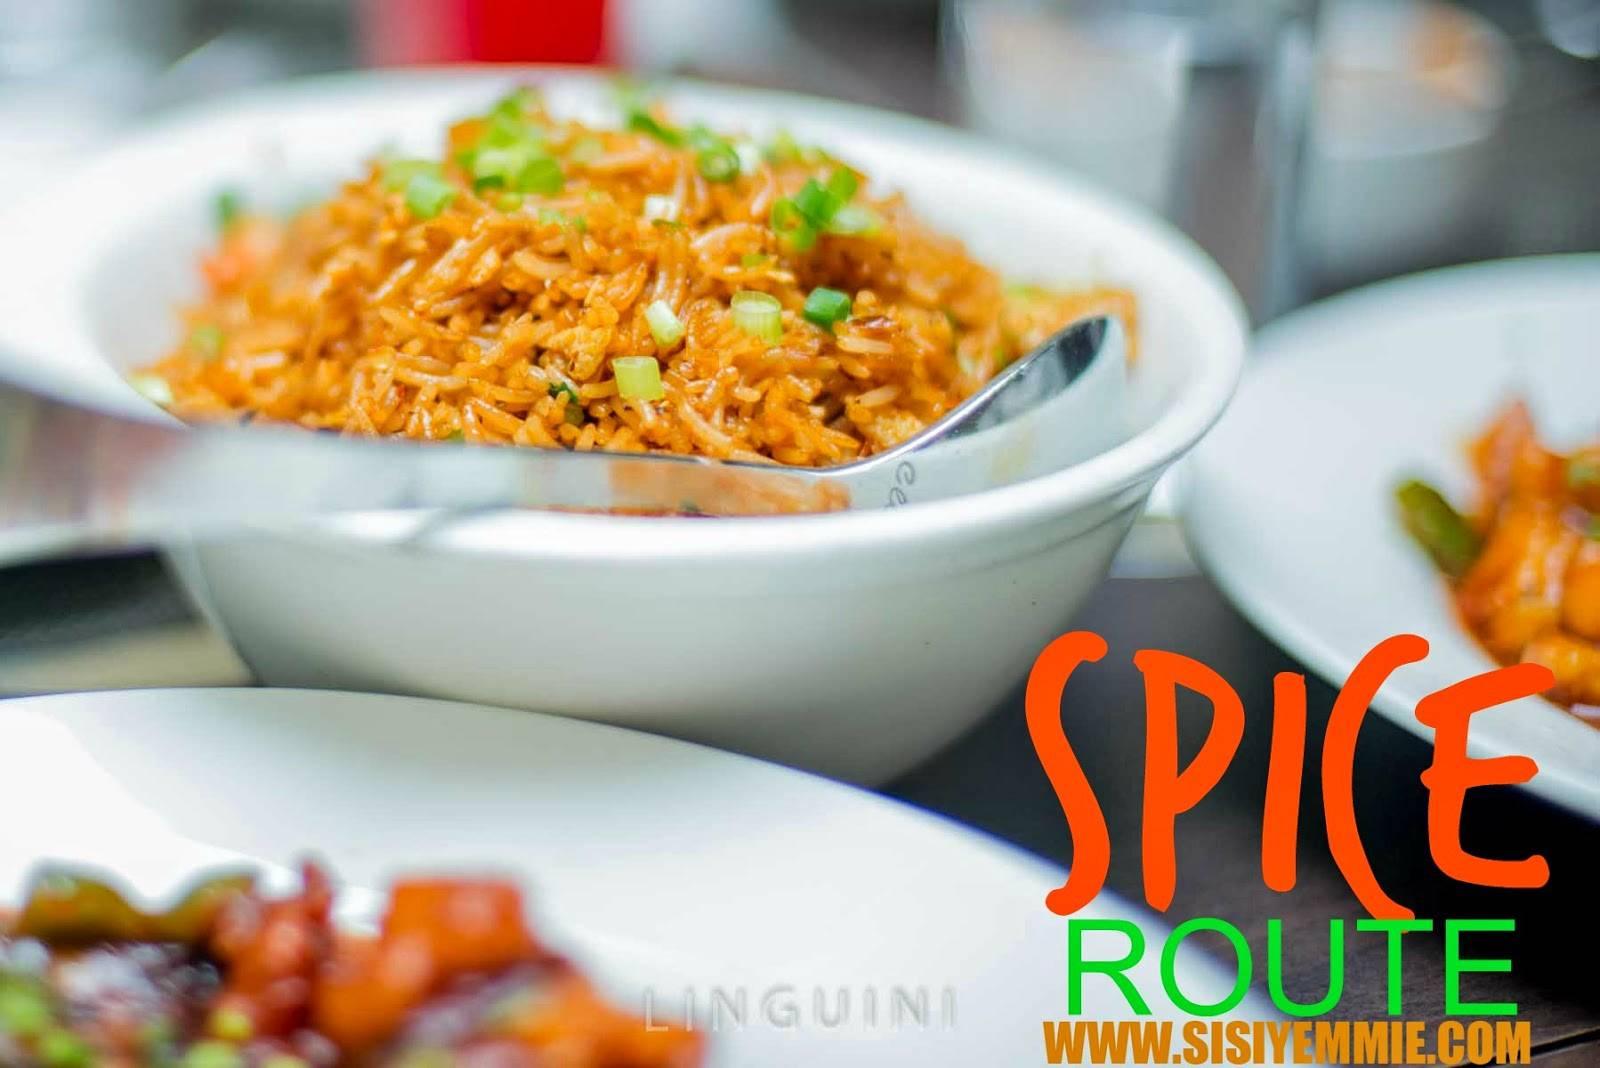 Spice Route, Lagos5